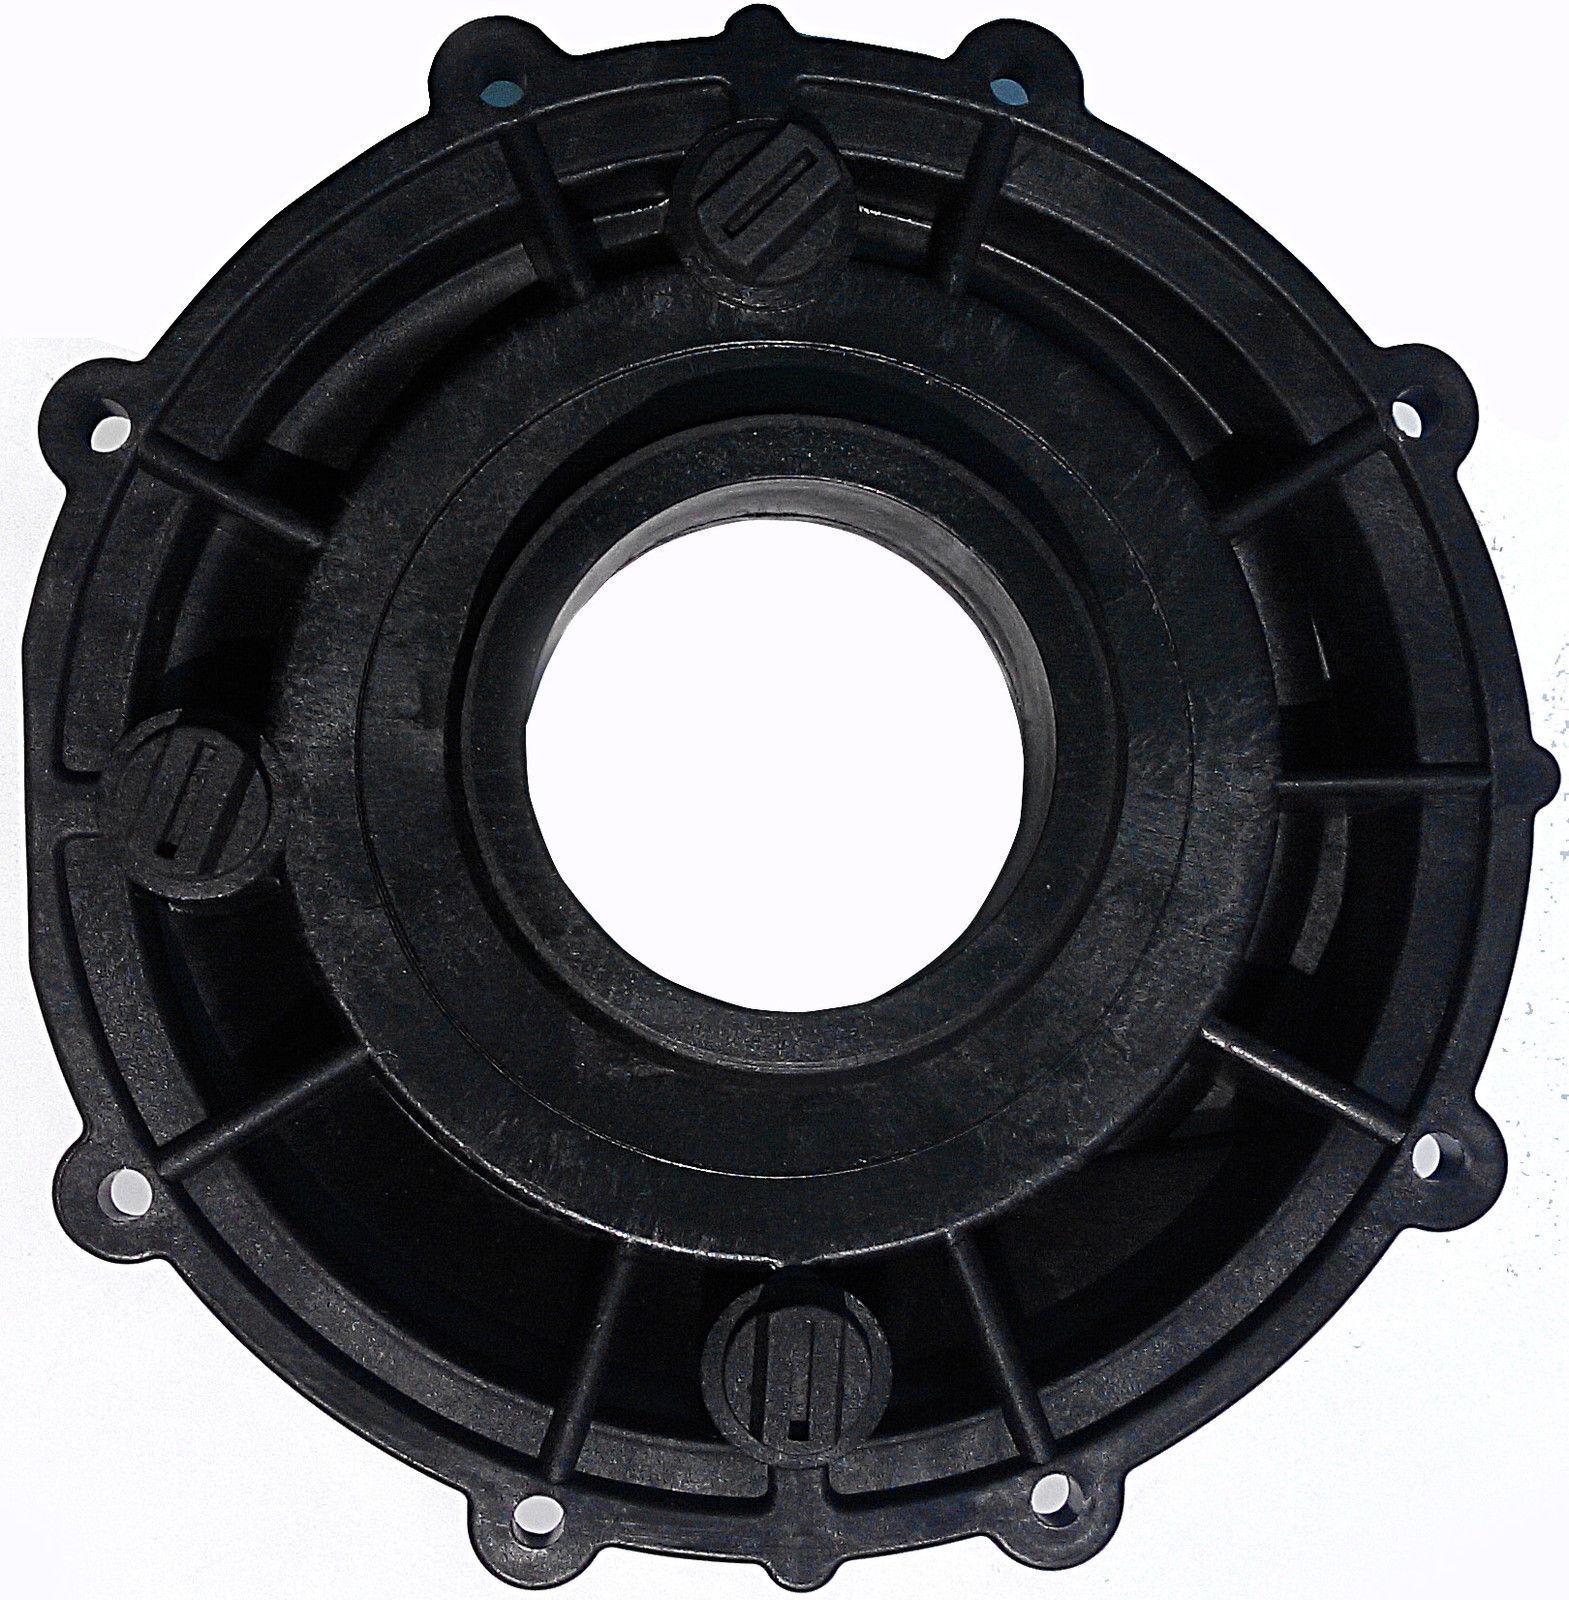 DXD-Motor Pumpe nass Ende FRONT FACEPLATE fts die DXD-330 Pumpen